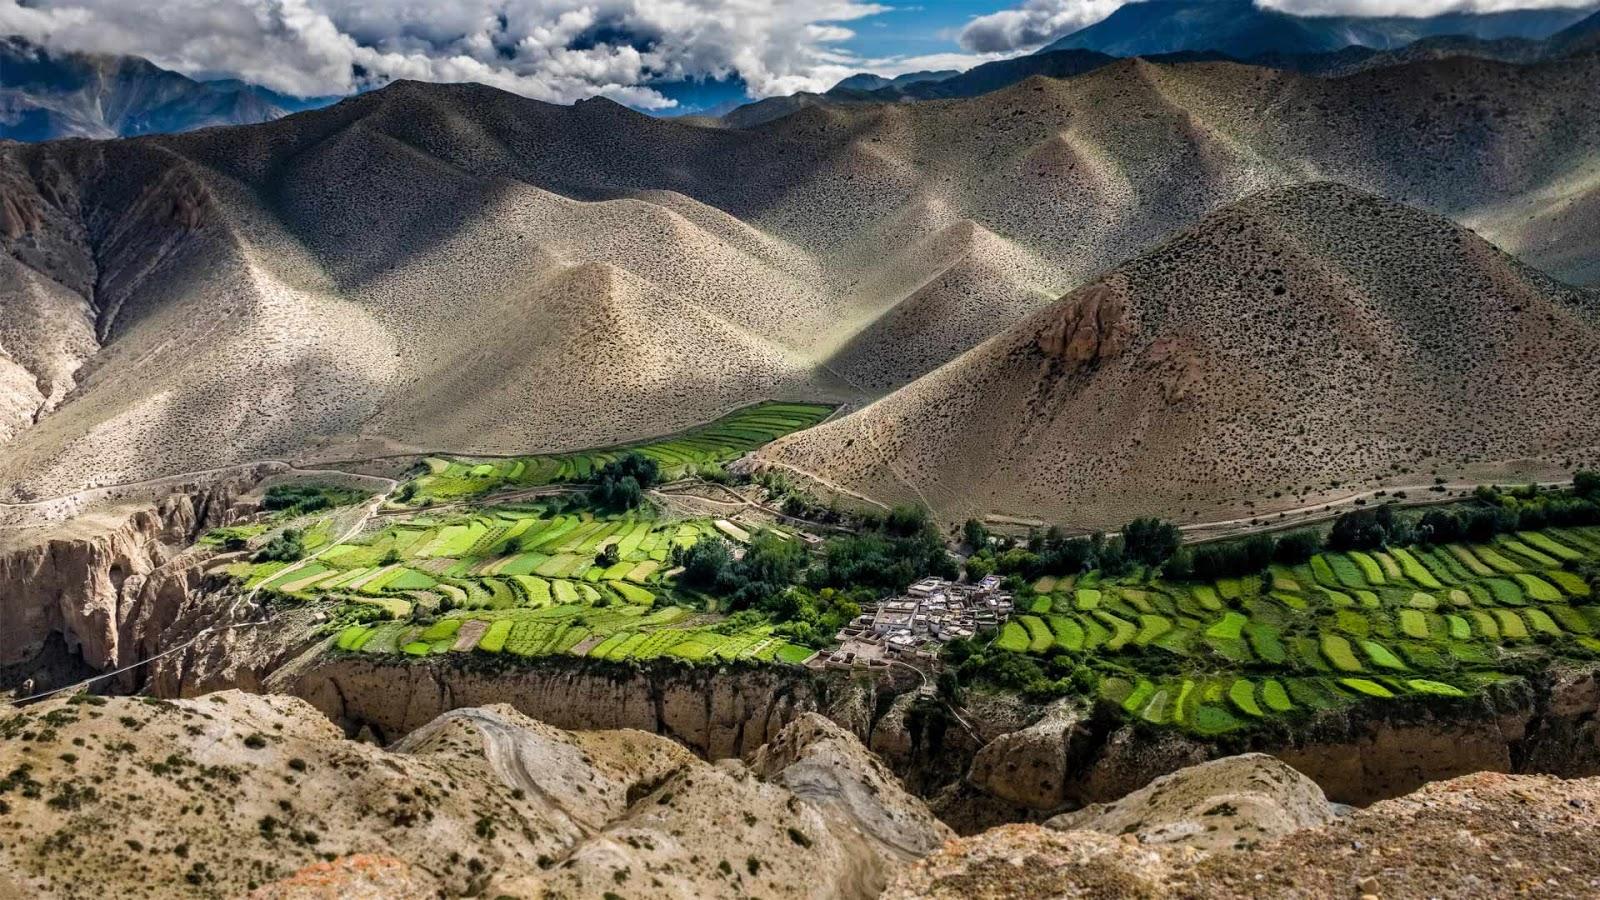 Ghyakar village, Upper Mustang, Nepal © Frank Bienewald/Alamy